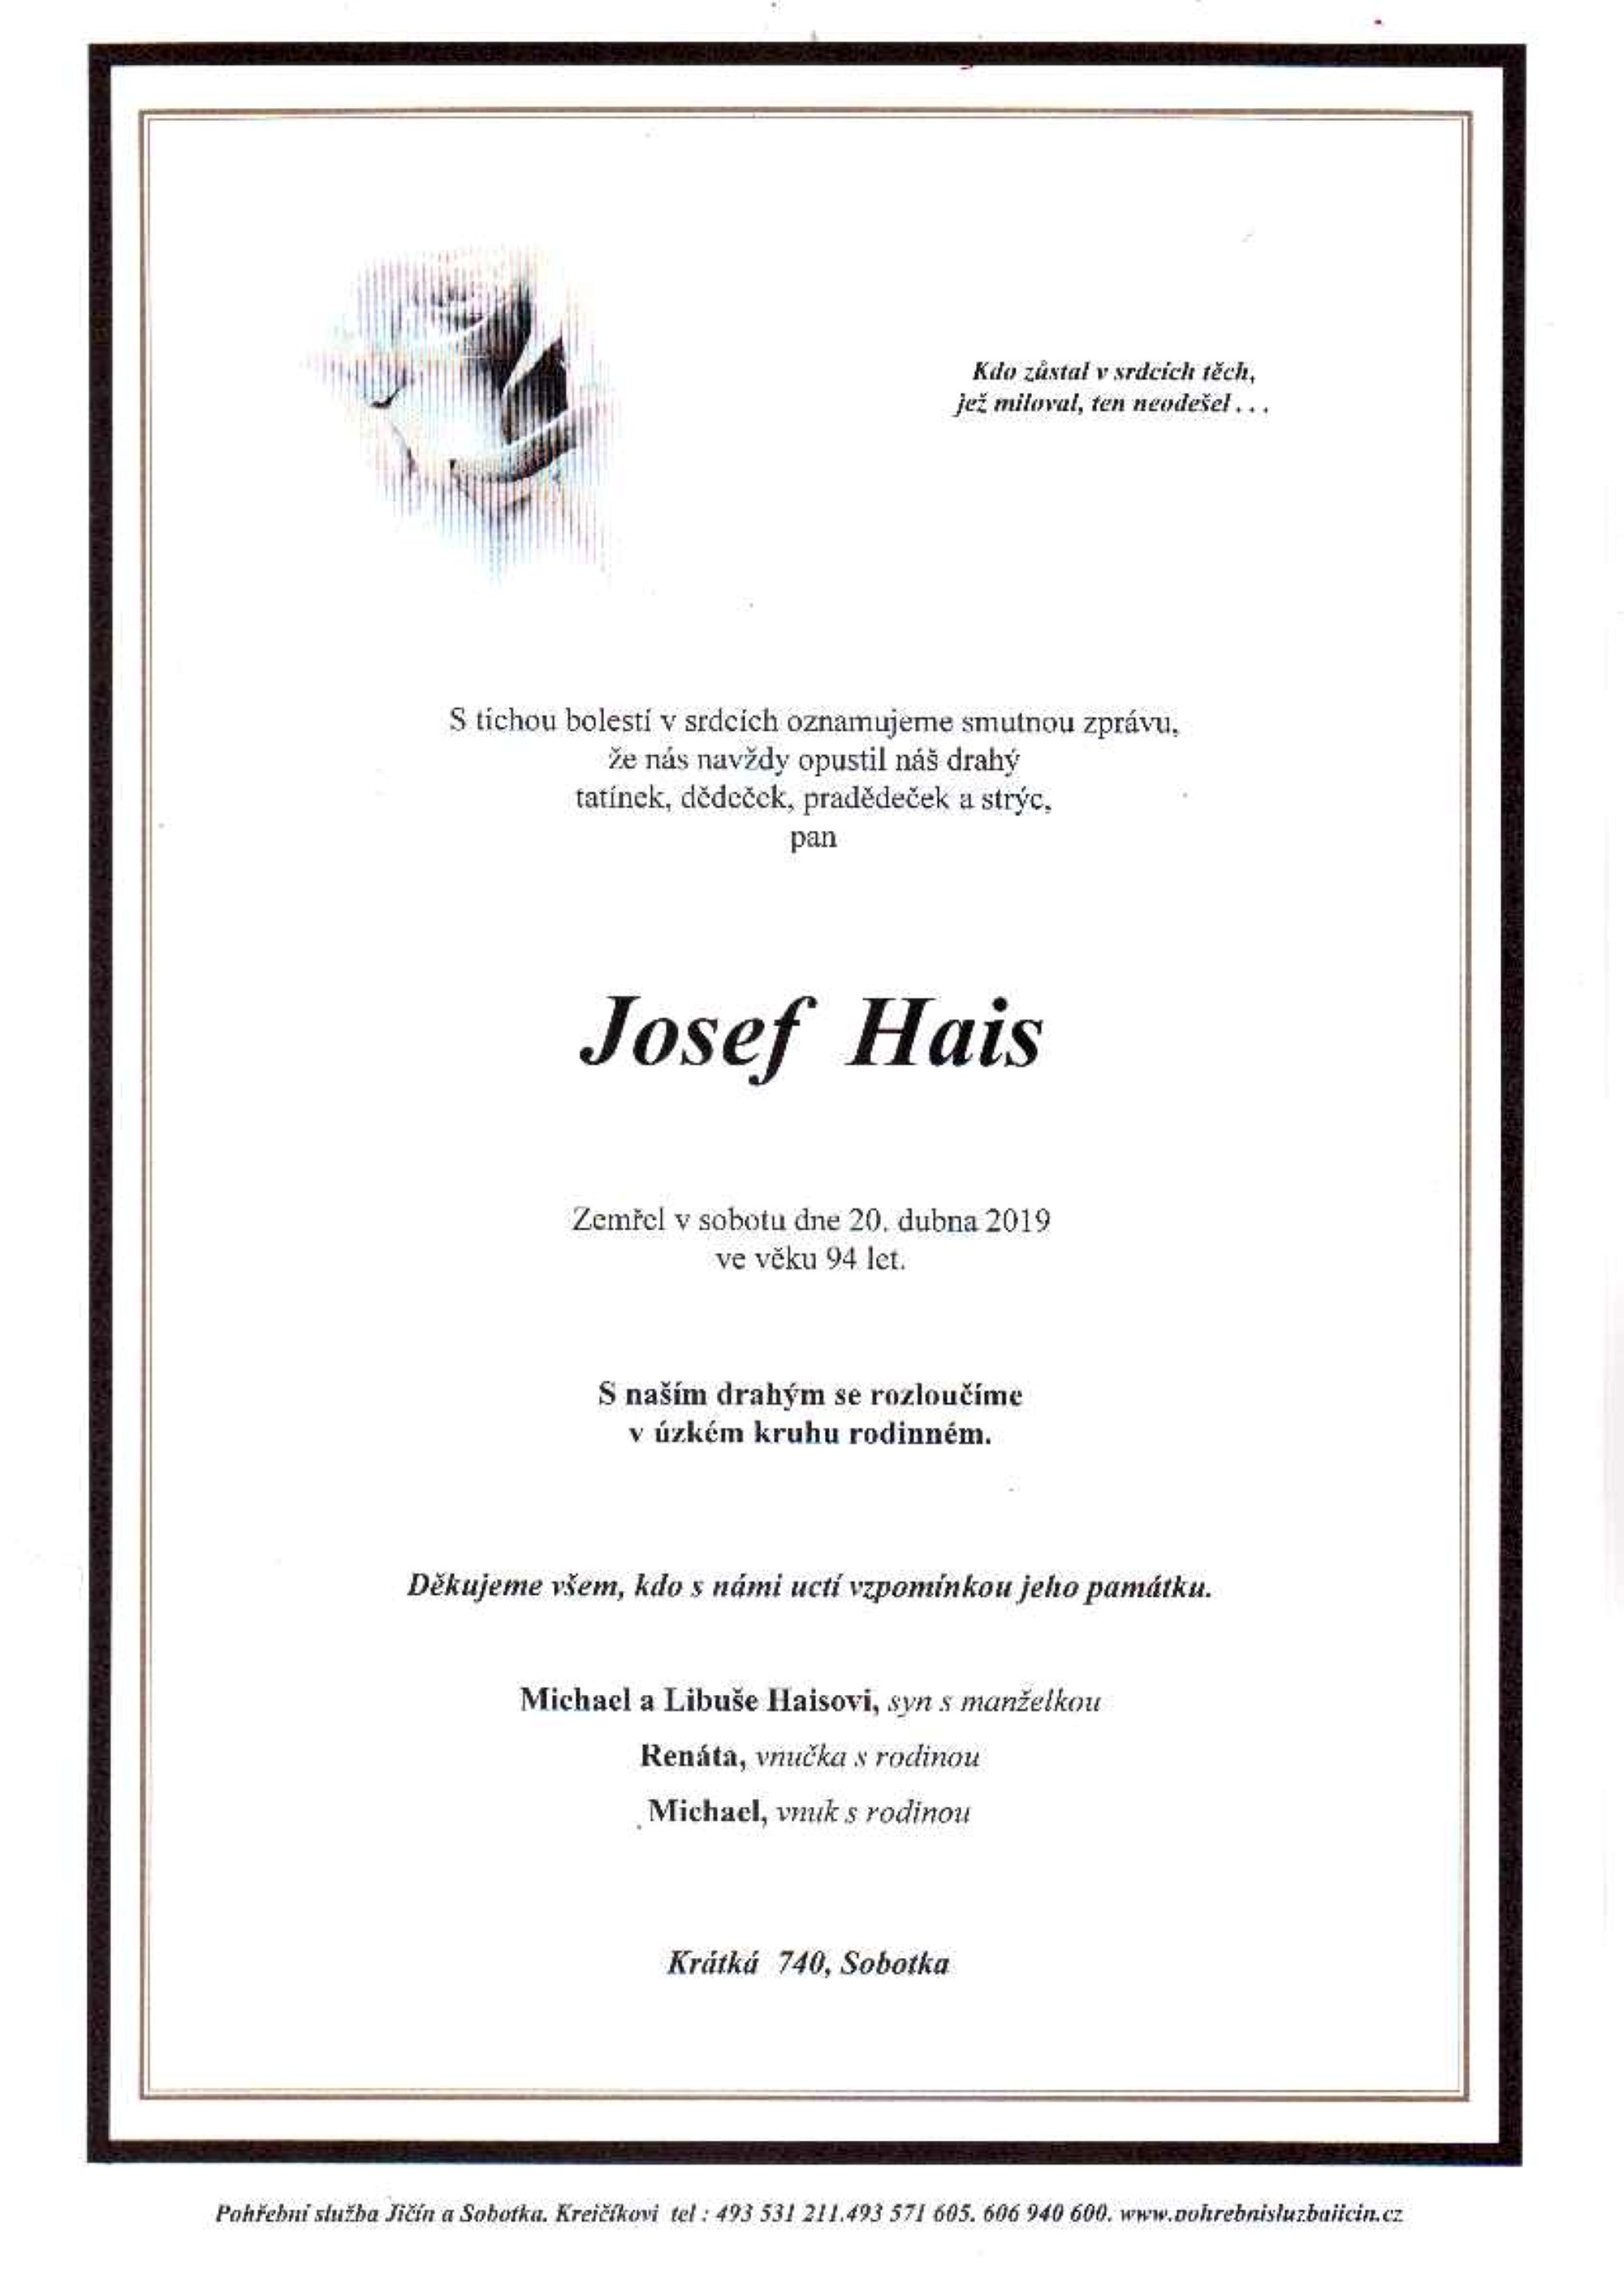 Josef Hais